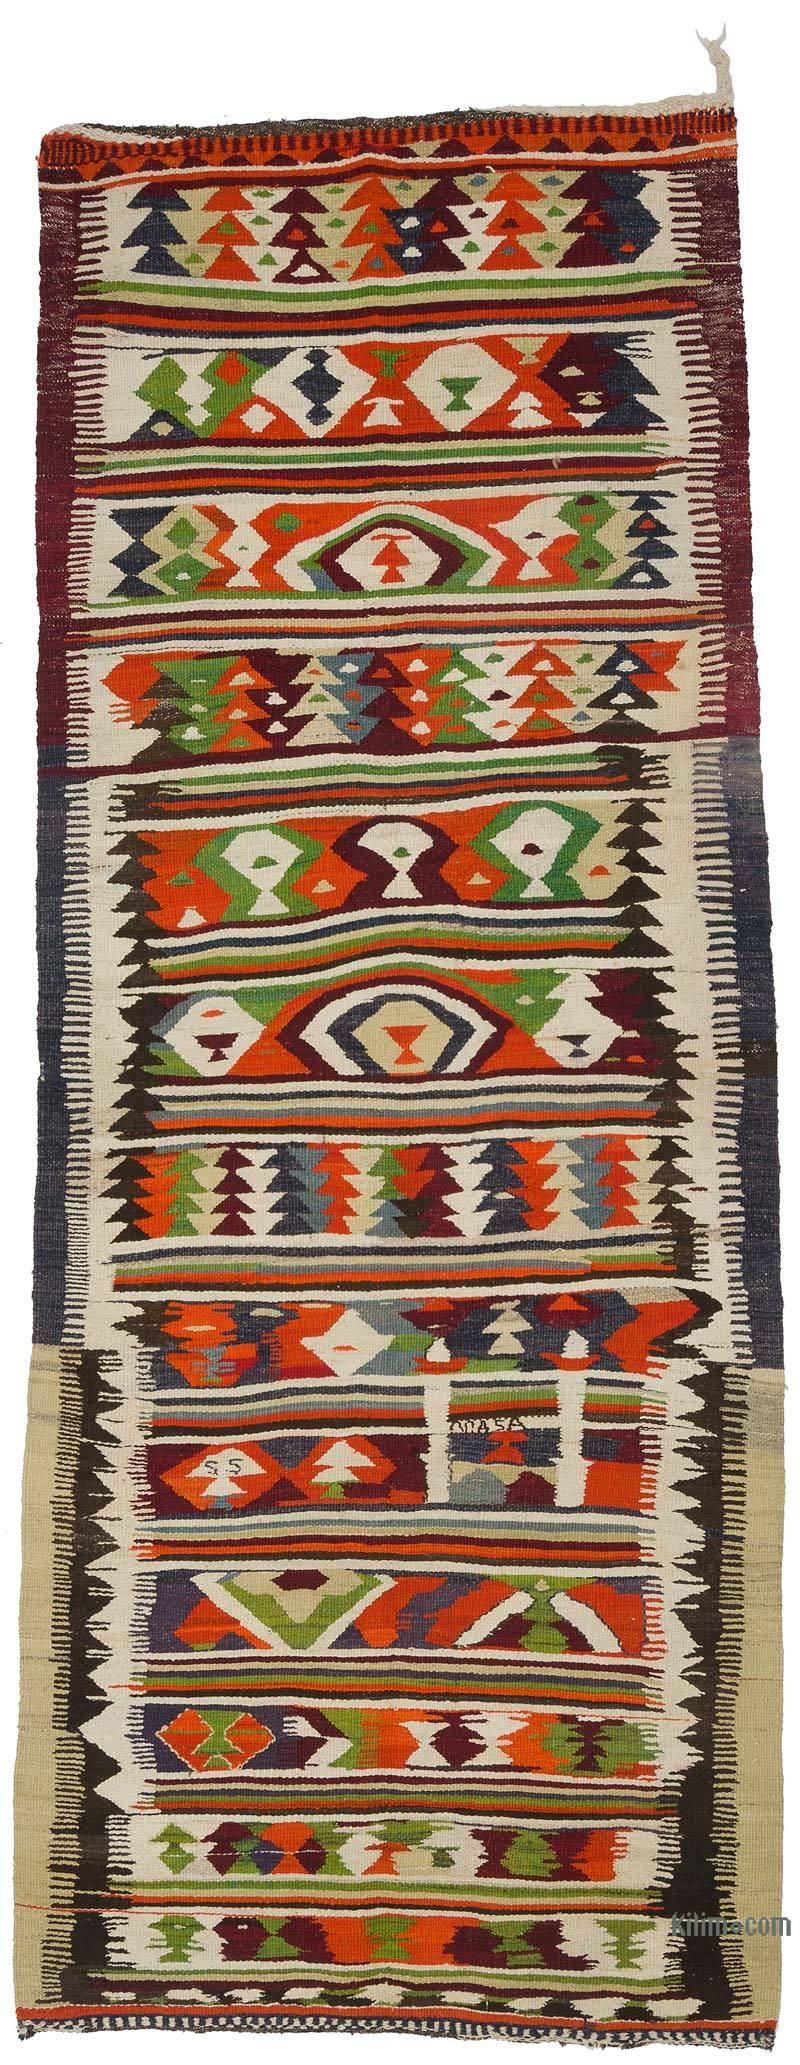 Multicolor Vintage Turkish Kilim Runner - 4' 1# x 10' 3# (49 in. x 123 in.) - K0016124